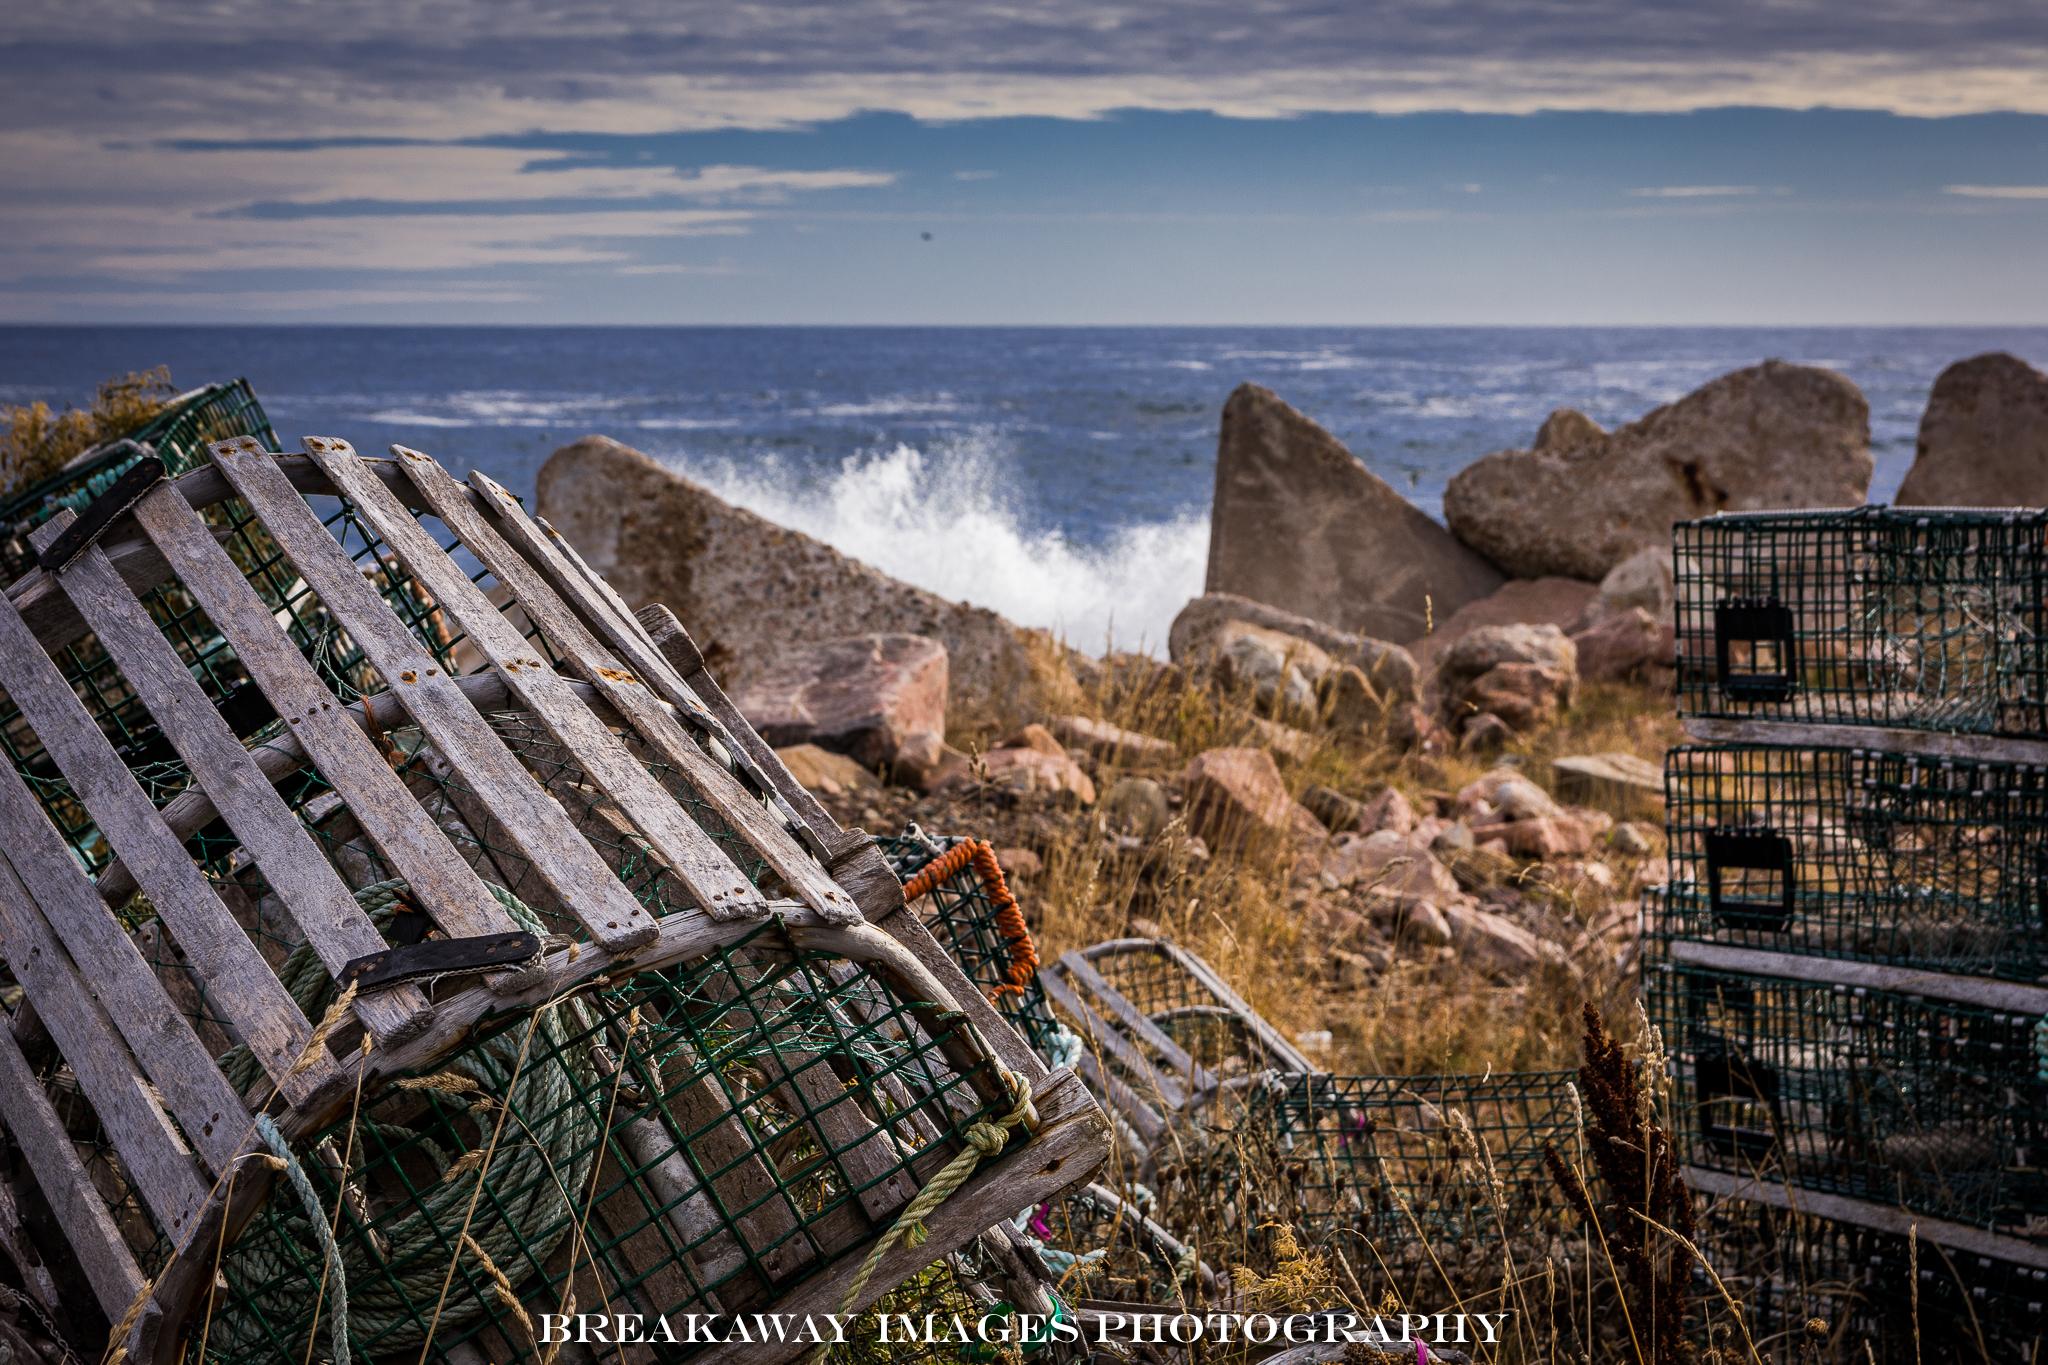 Lobster Traps and Surf, Neil's Harbor, Nova Scotia